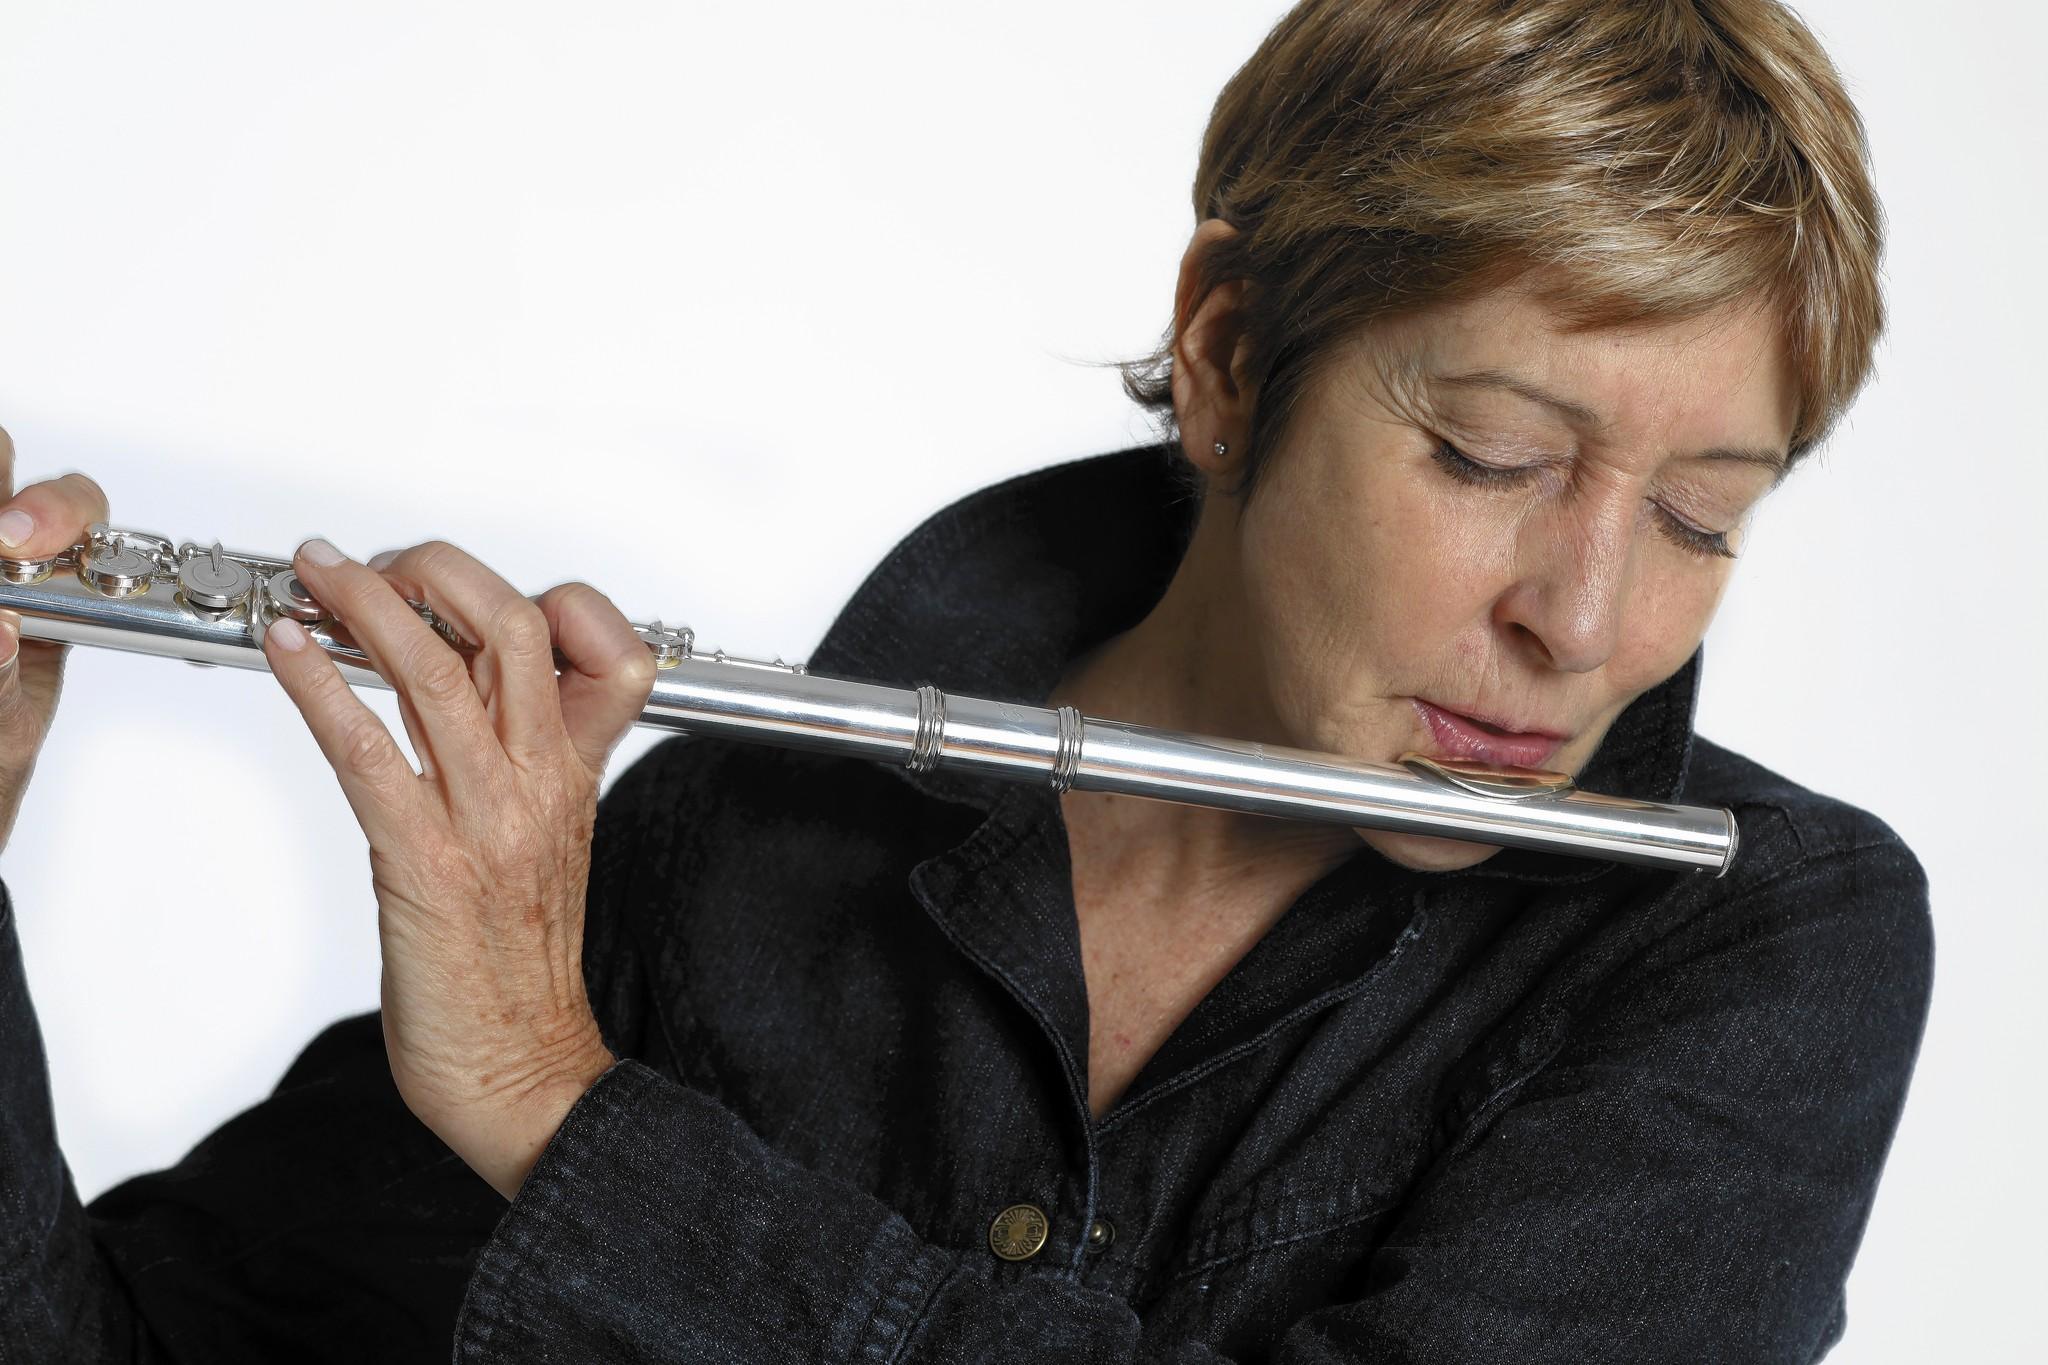 Ali_Ryerson_playing_flute.jpg